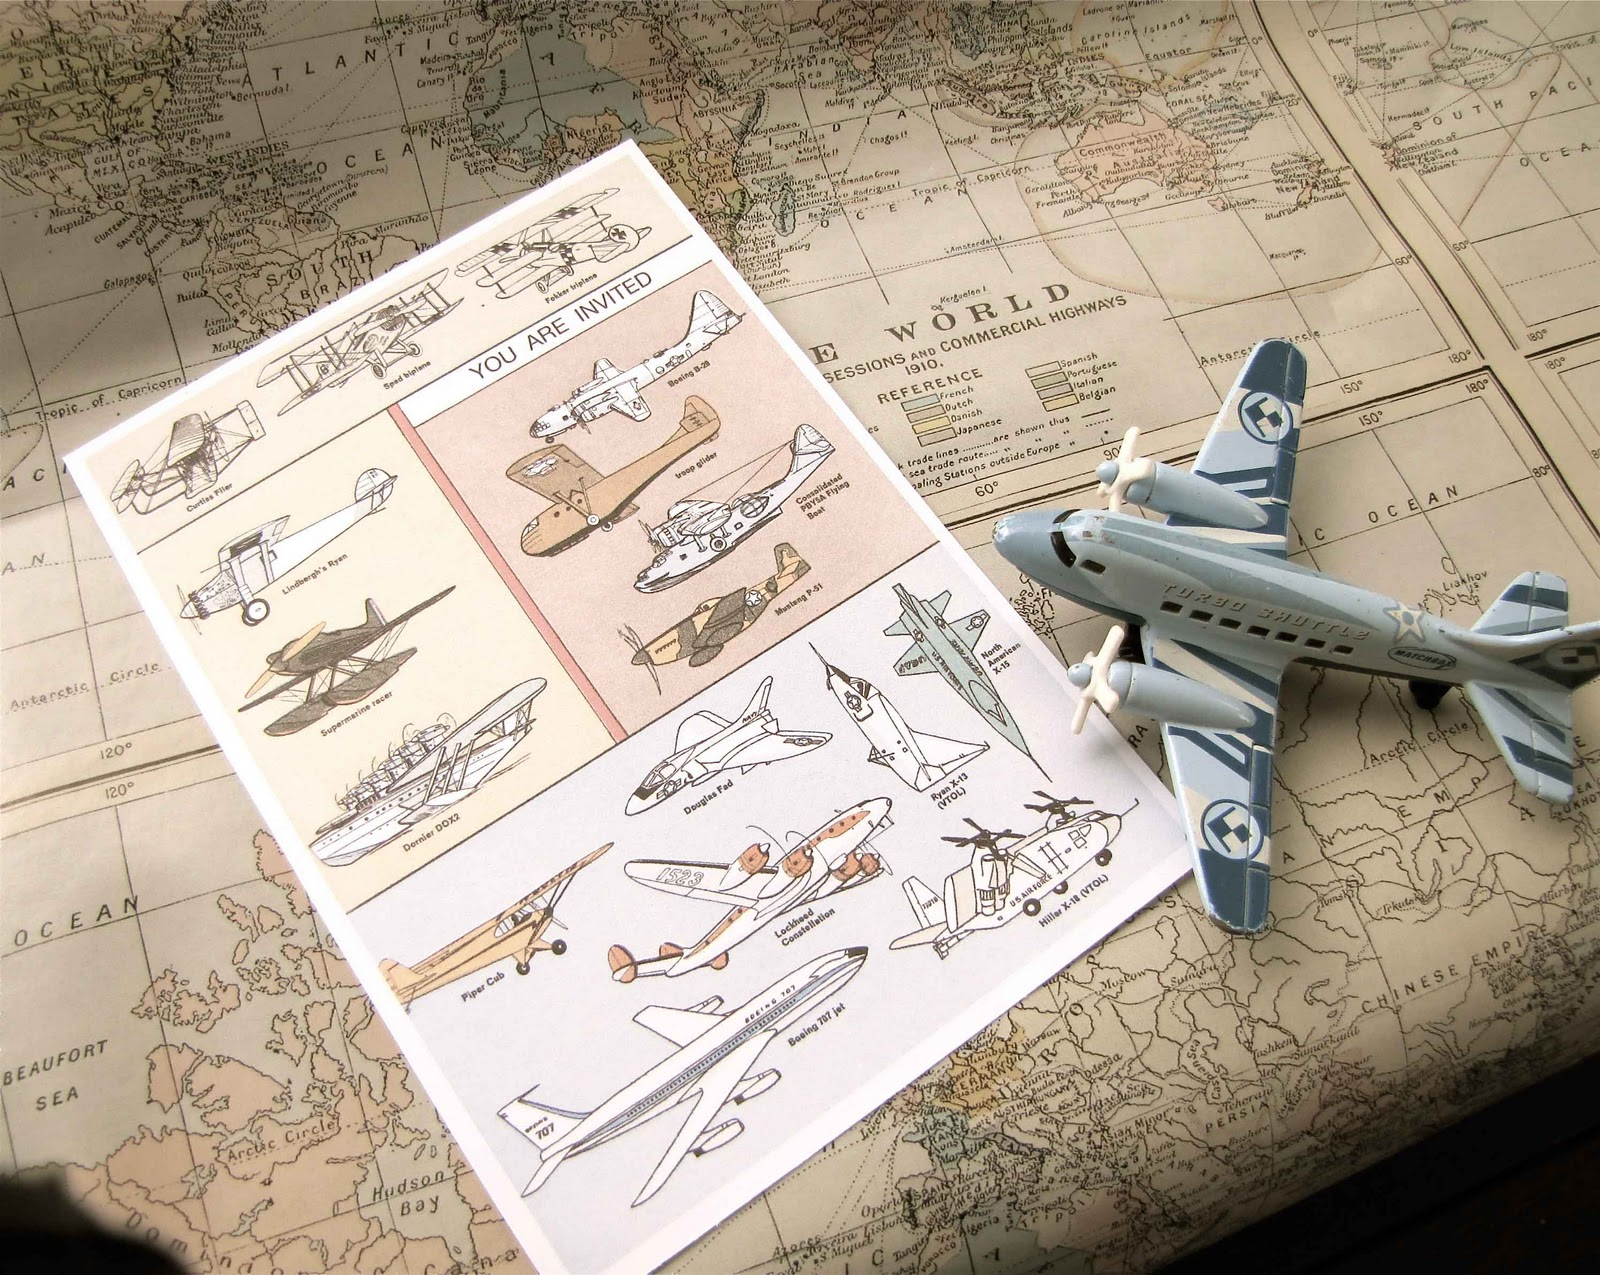 Vintage Flight Airplane Party - Vintage aviation maps